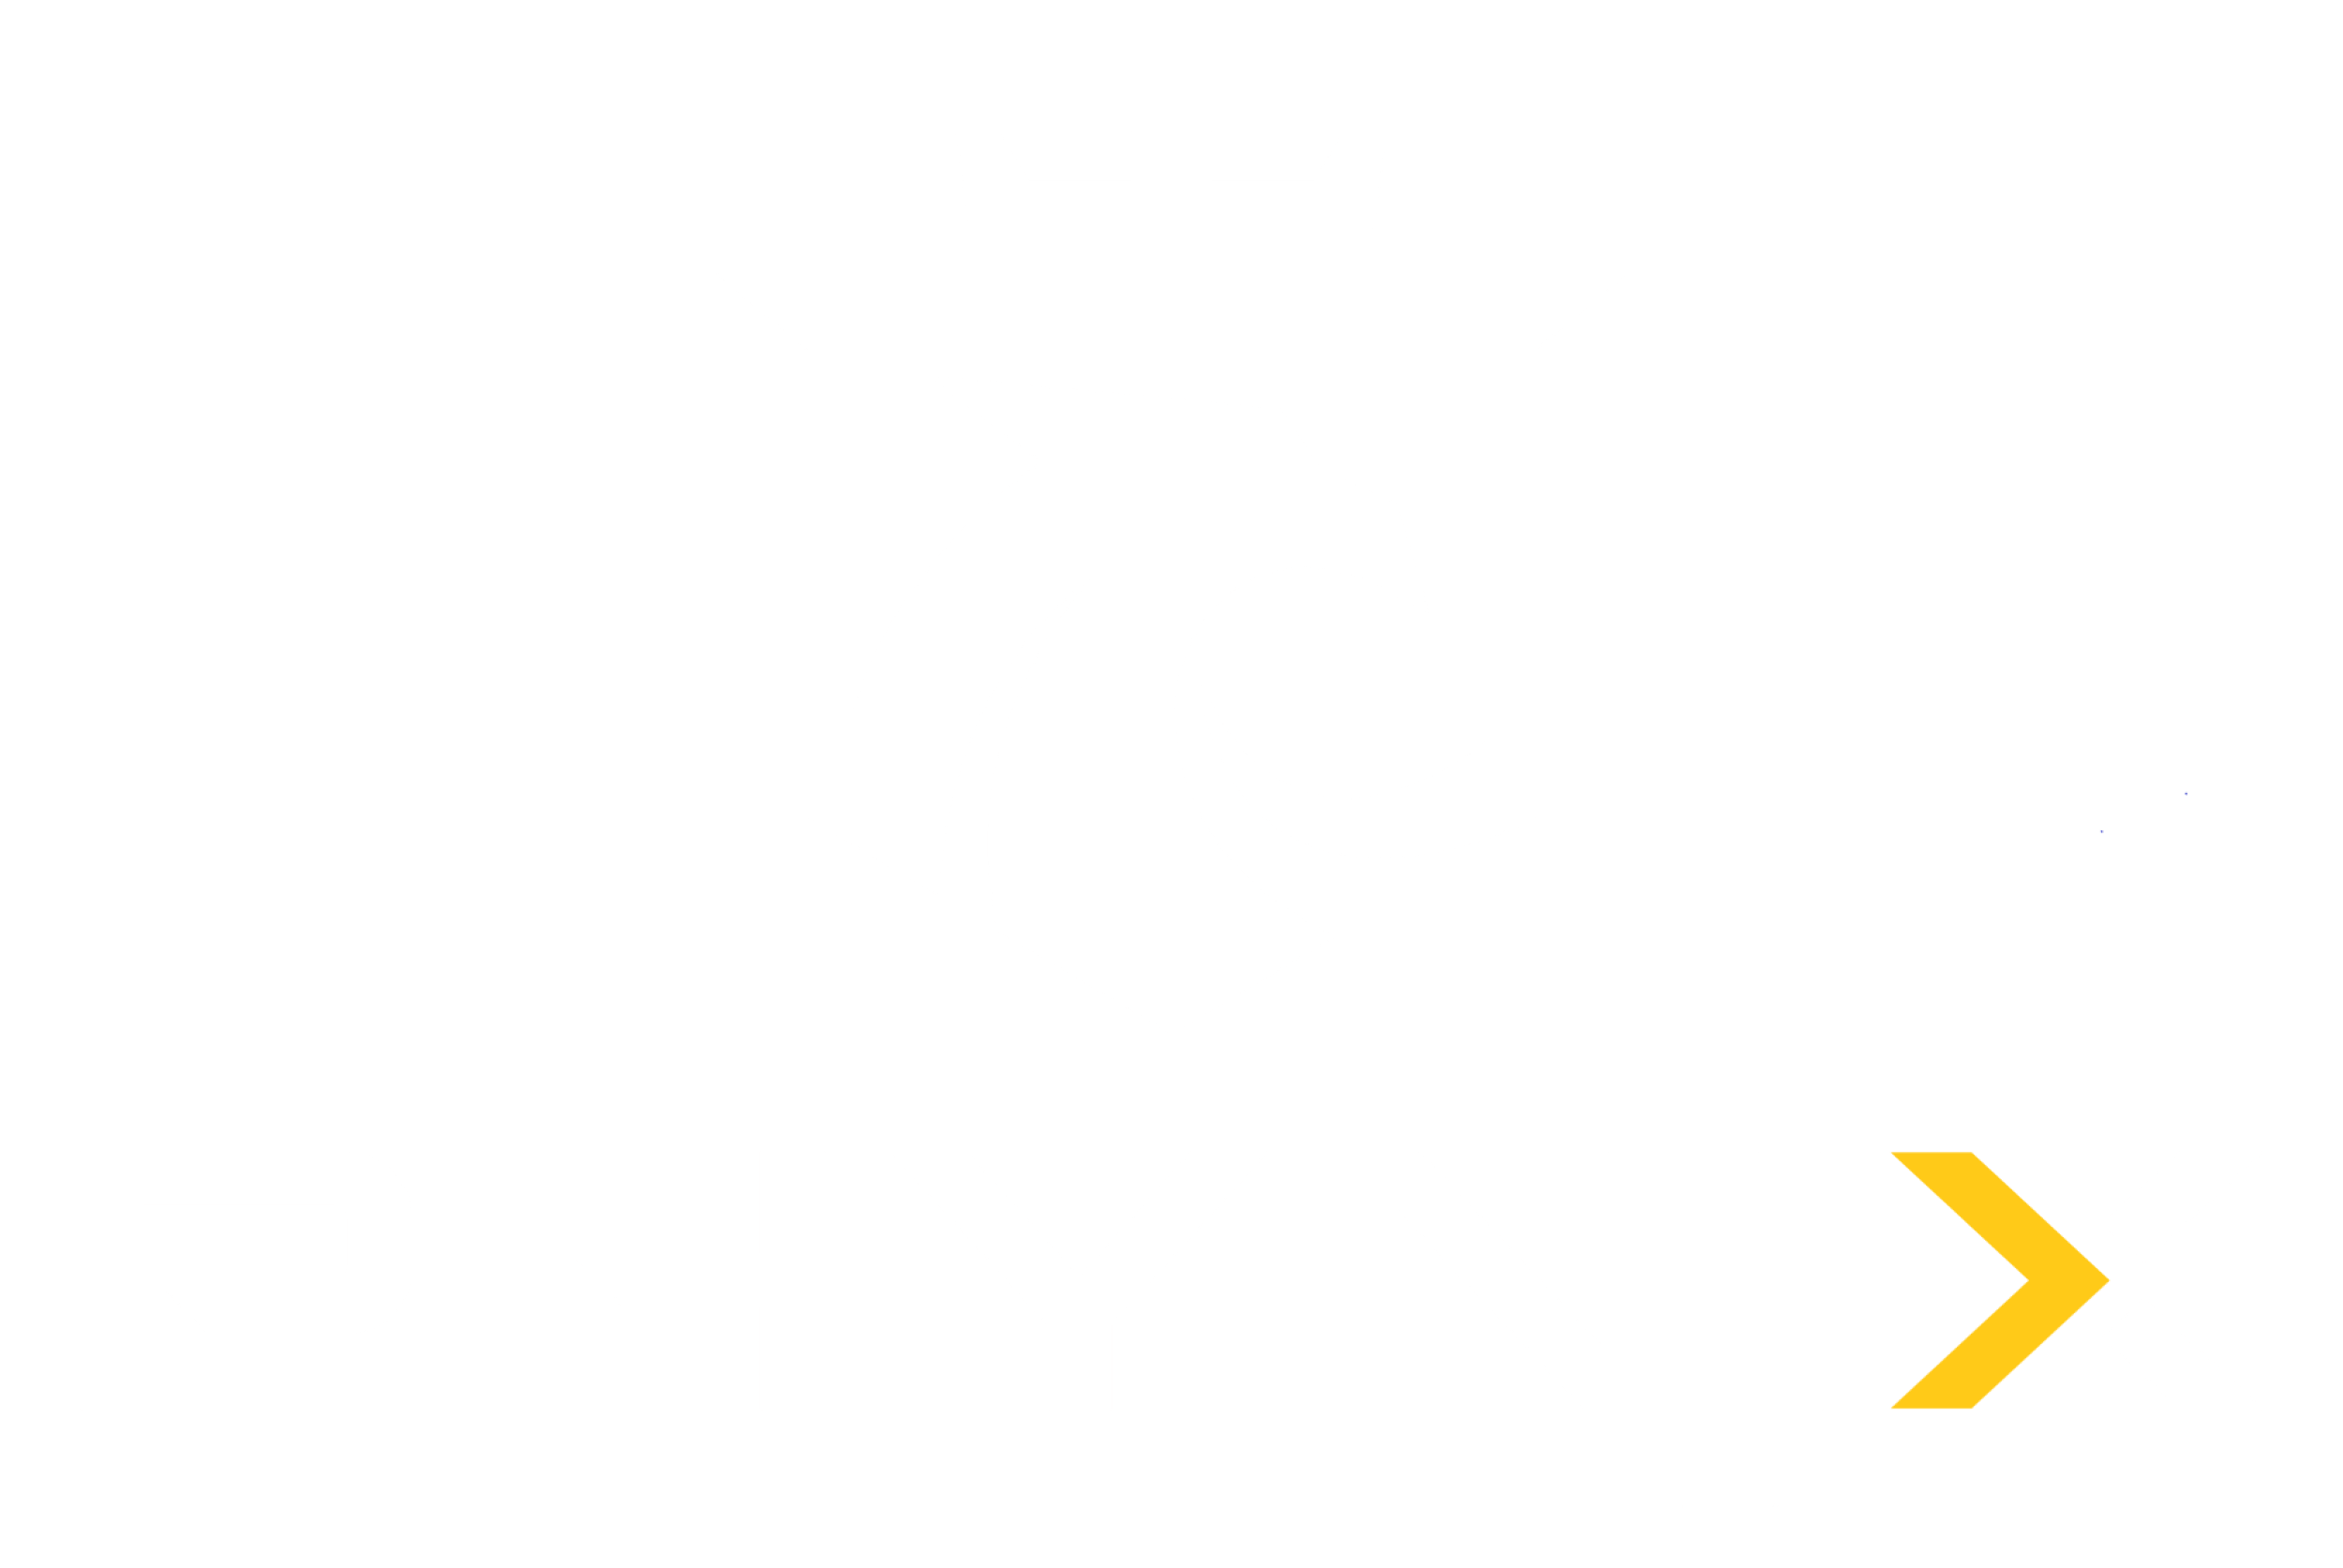 logo-header-groter